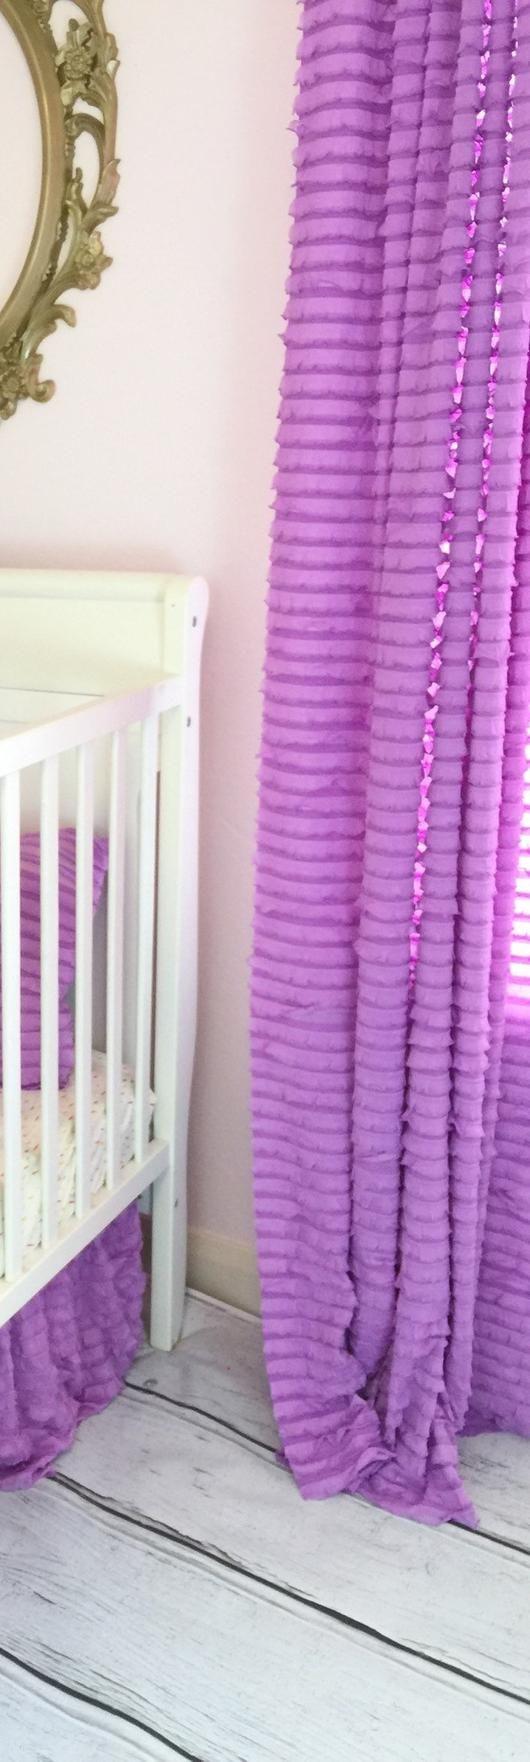 Lilac Bedroom Curtains 17 Best Ideas About Curtains For Nursery On Pinterest Nursery